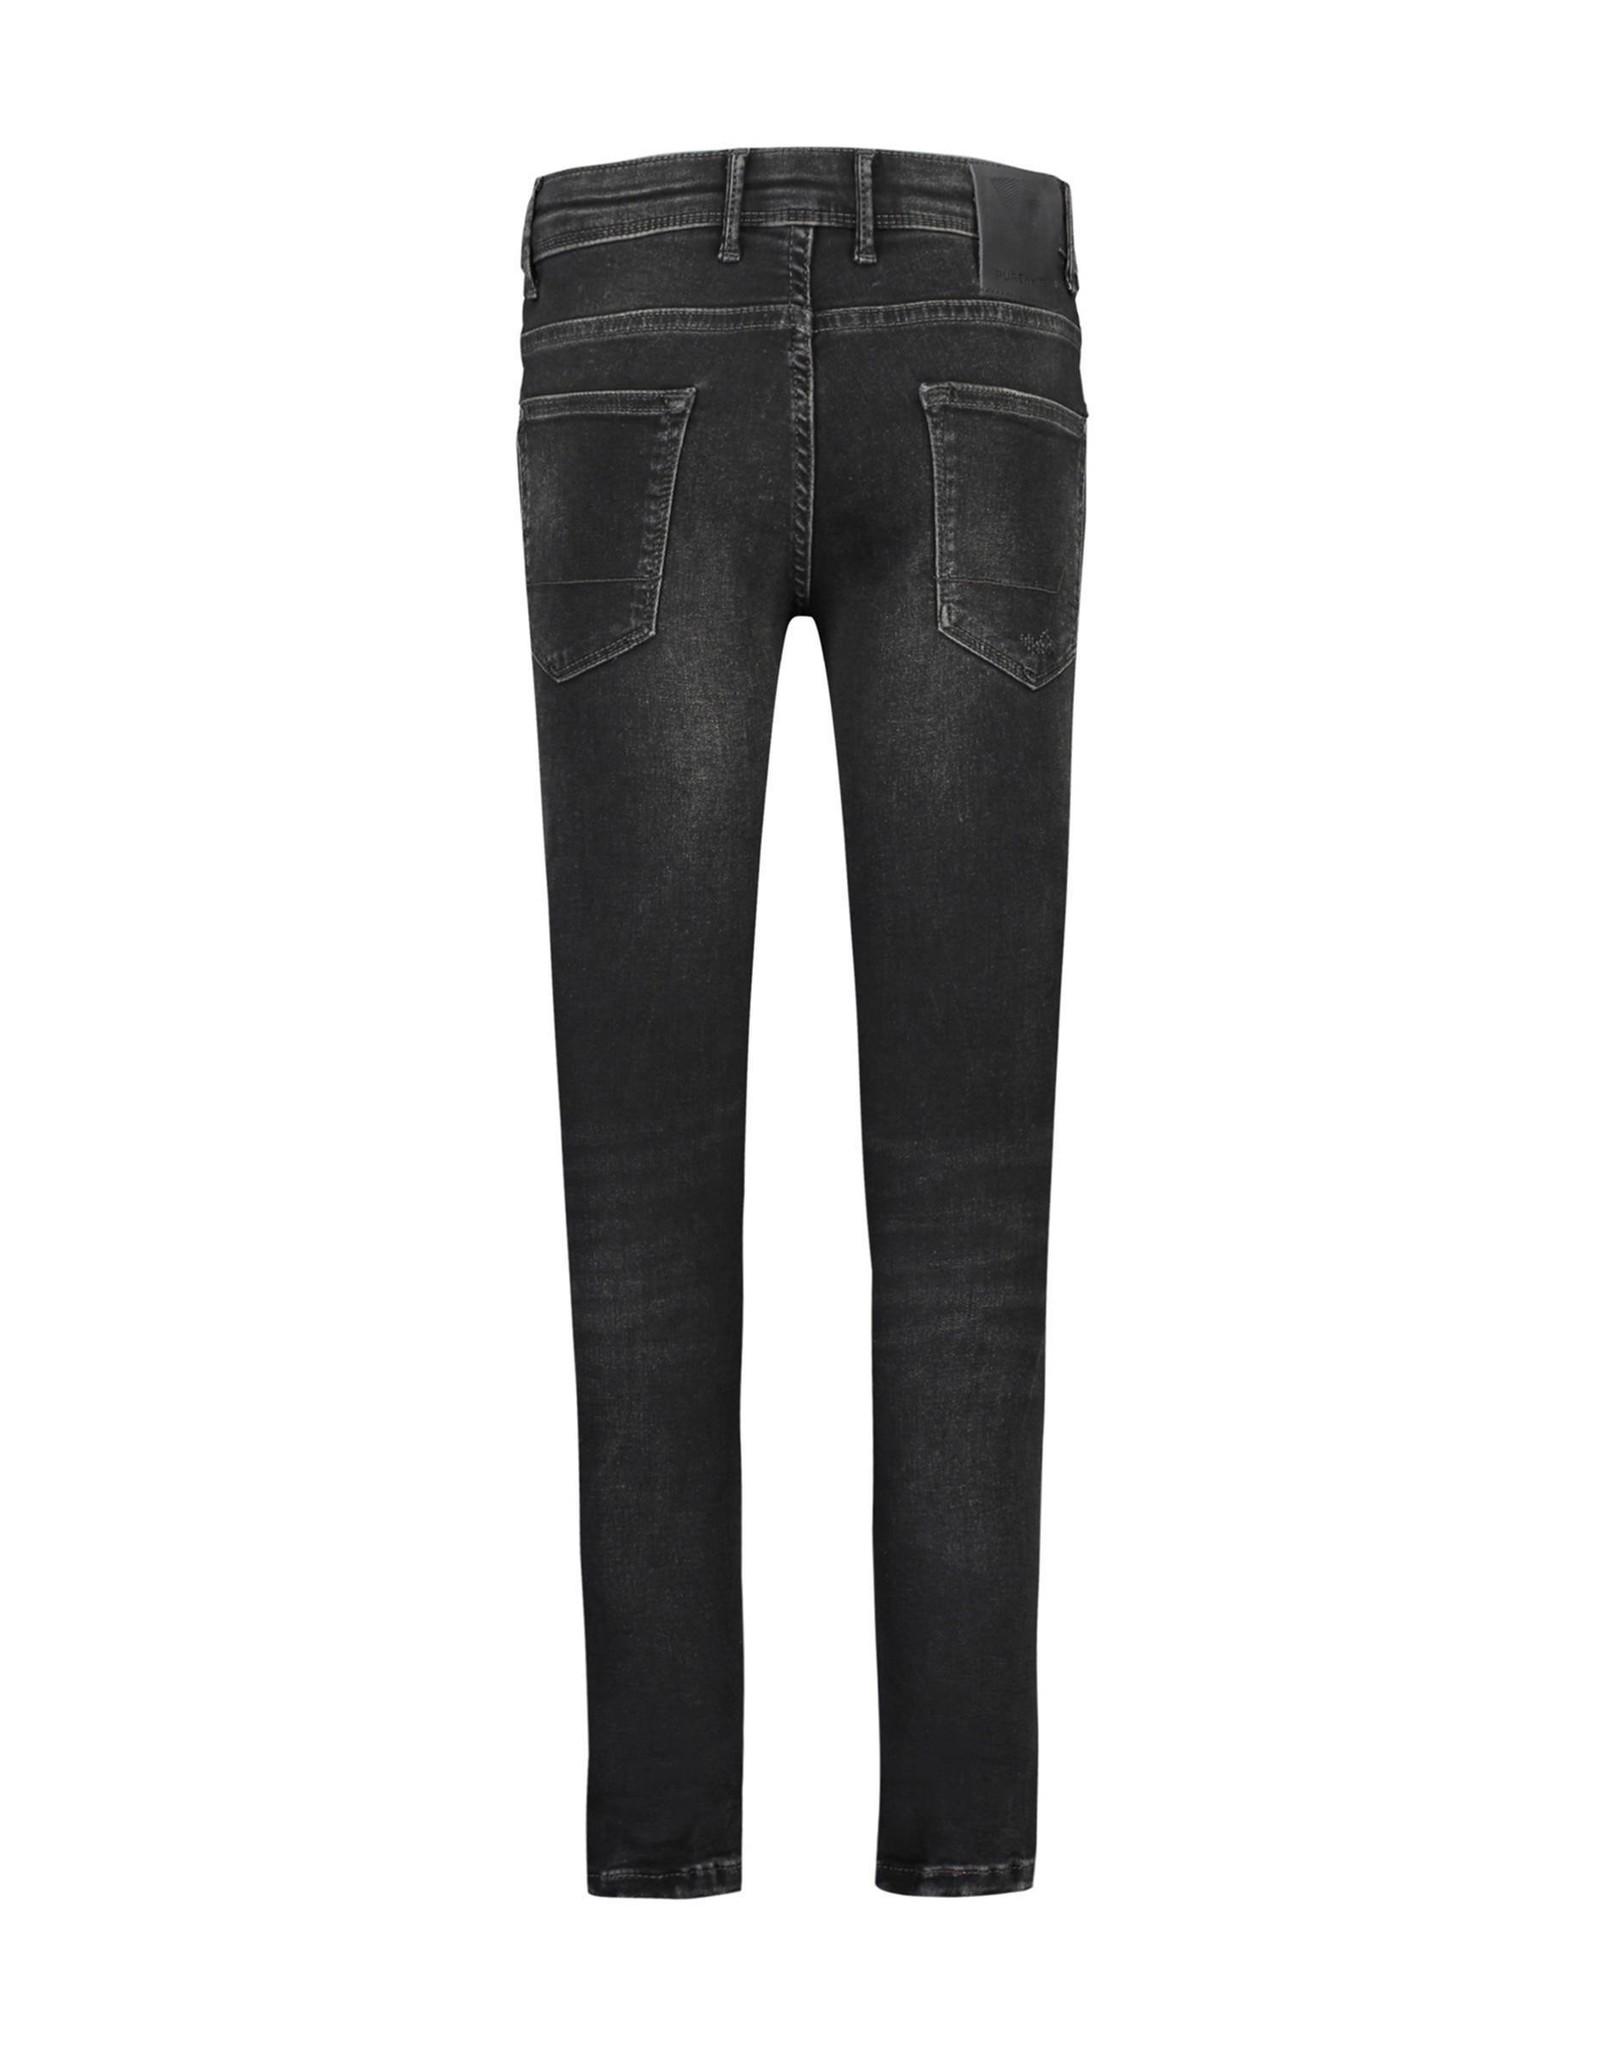 Ballin Amsterdam Jeans Black